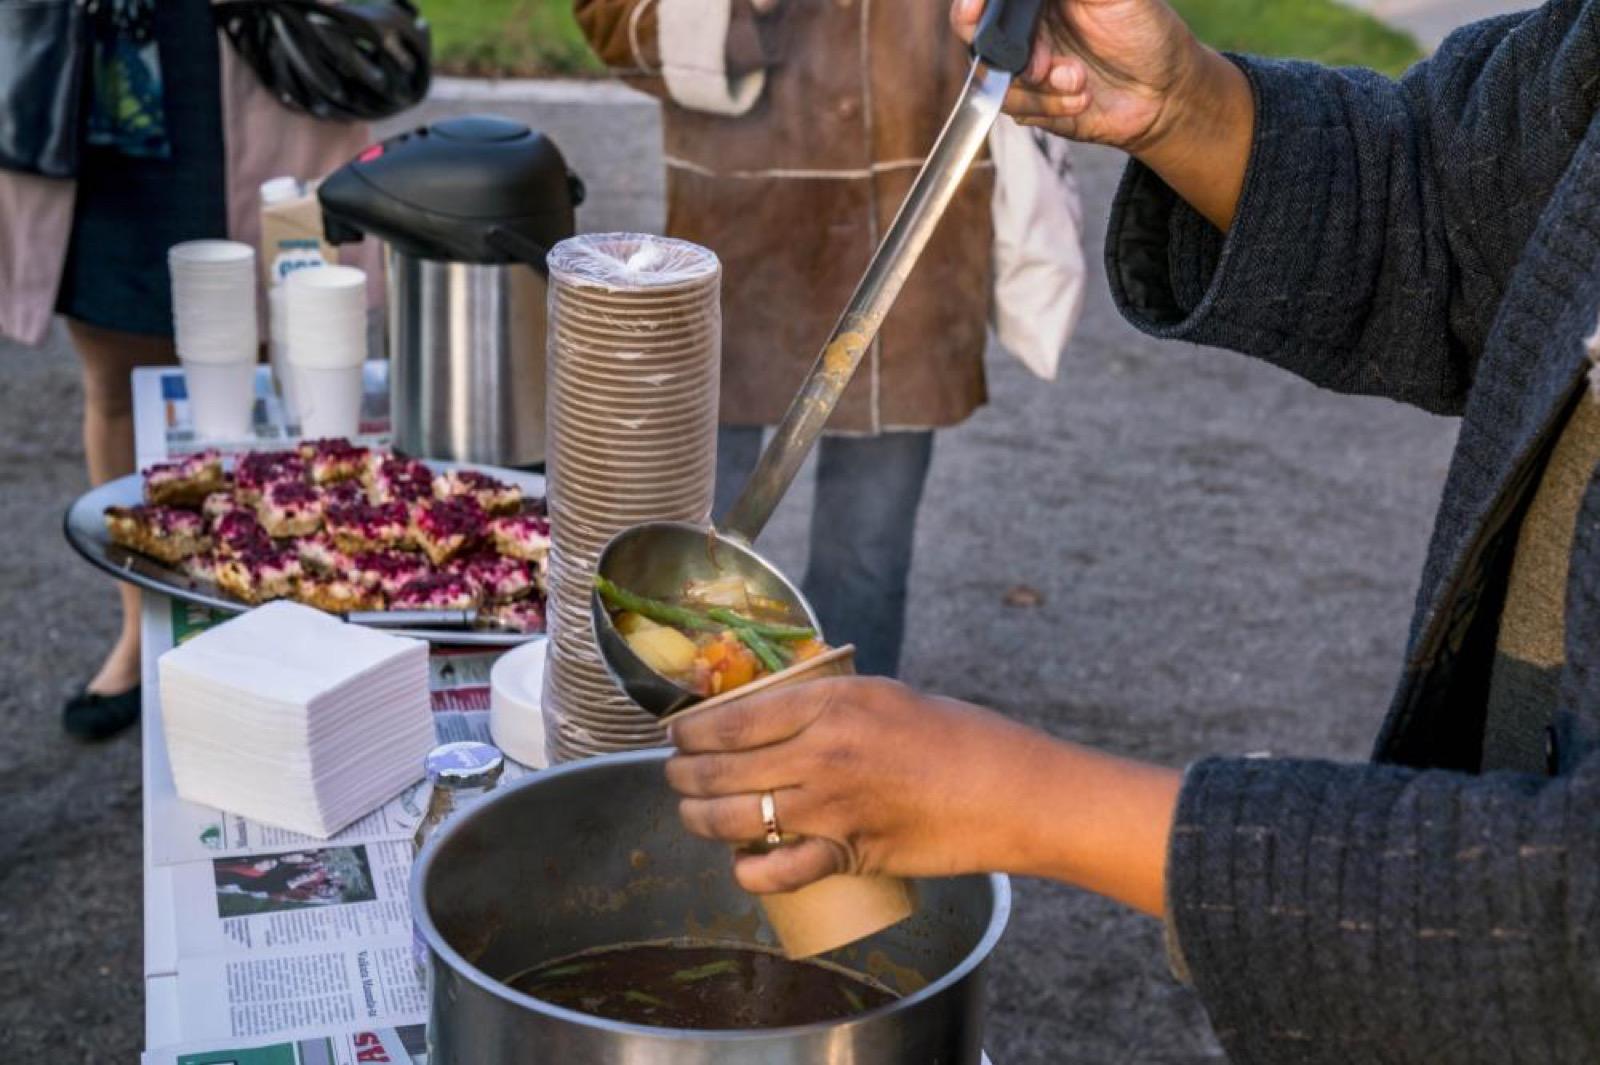 Partizaning Maunula, Ali Akbar Mehta and Vidha Saumya making soup, 2017, photo: Vesa Pekka Gronfors